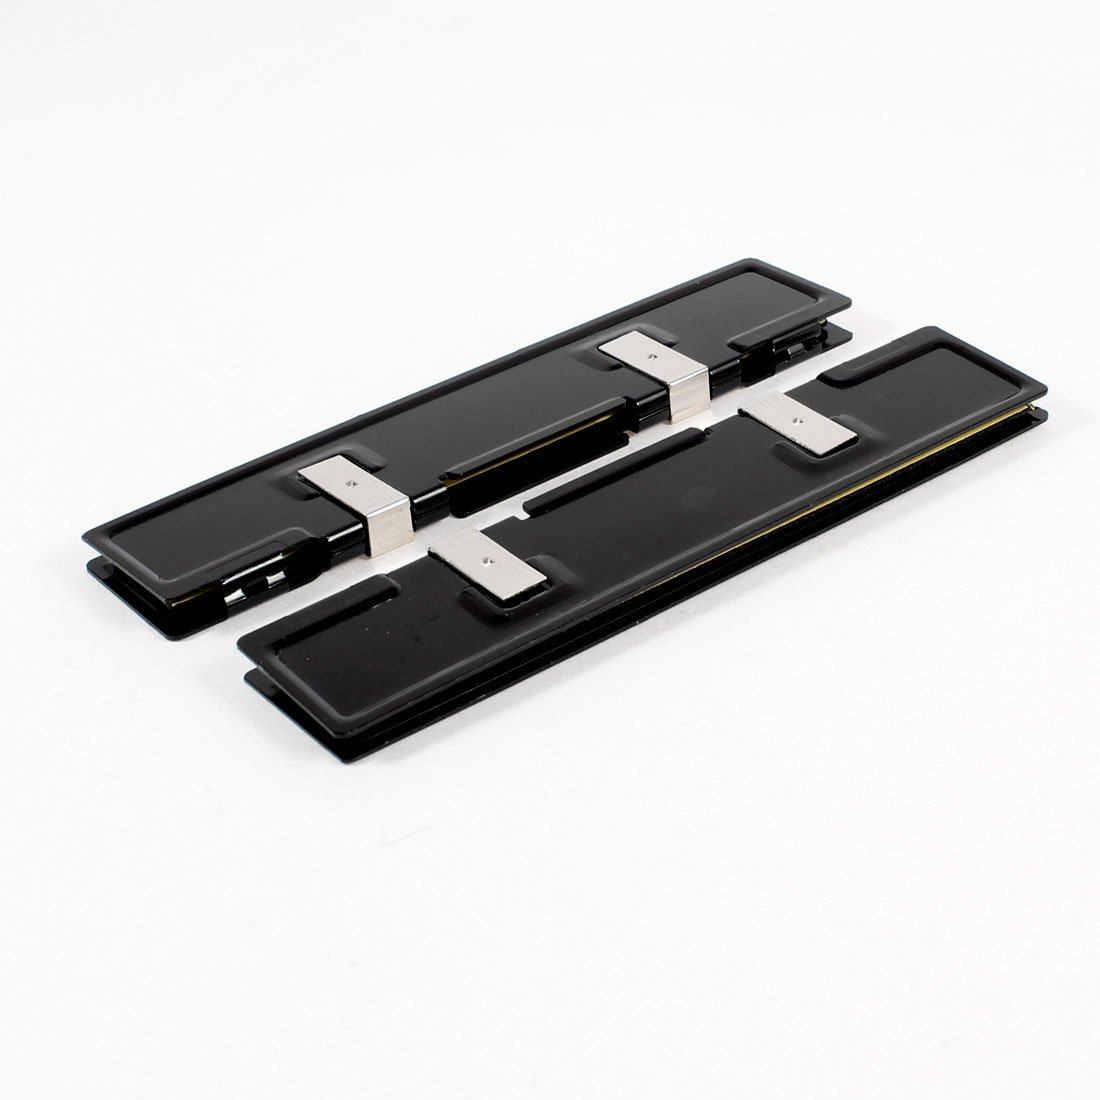 все цены на GTFS Hot 2 x Aluminum Heatsink Shim Spreader for DDR RAM Memory онлайн